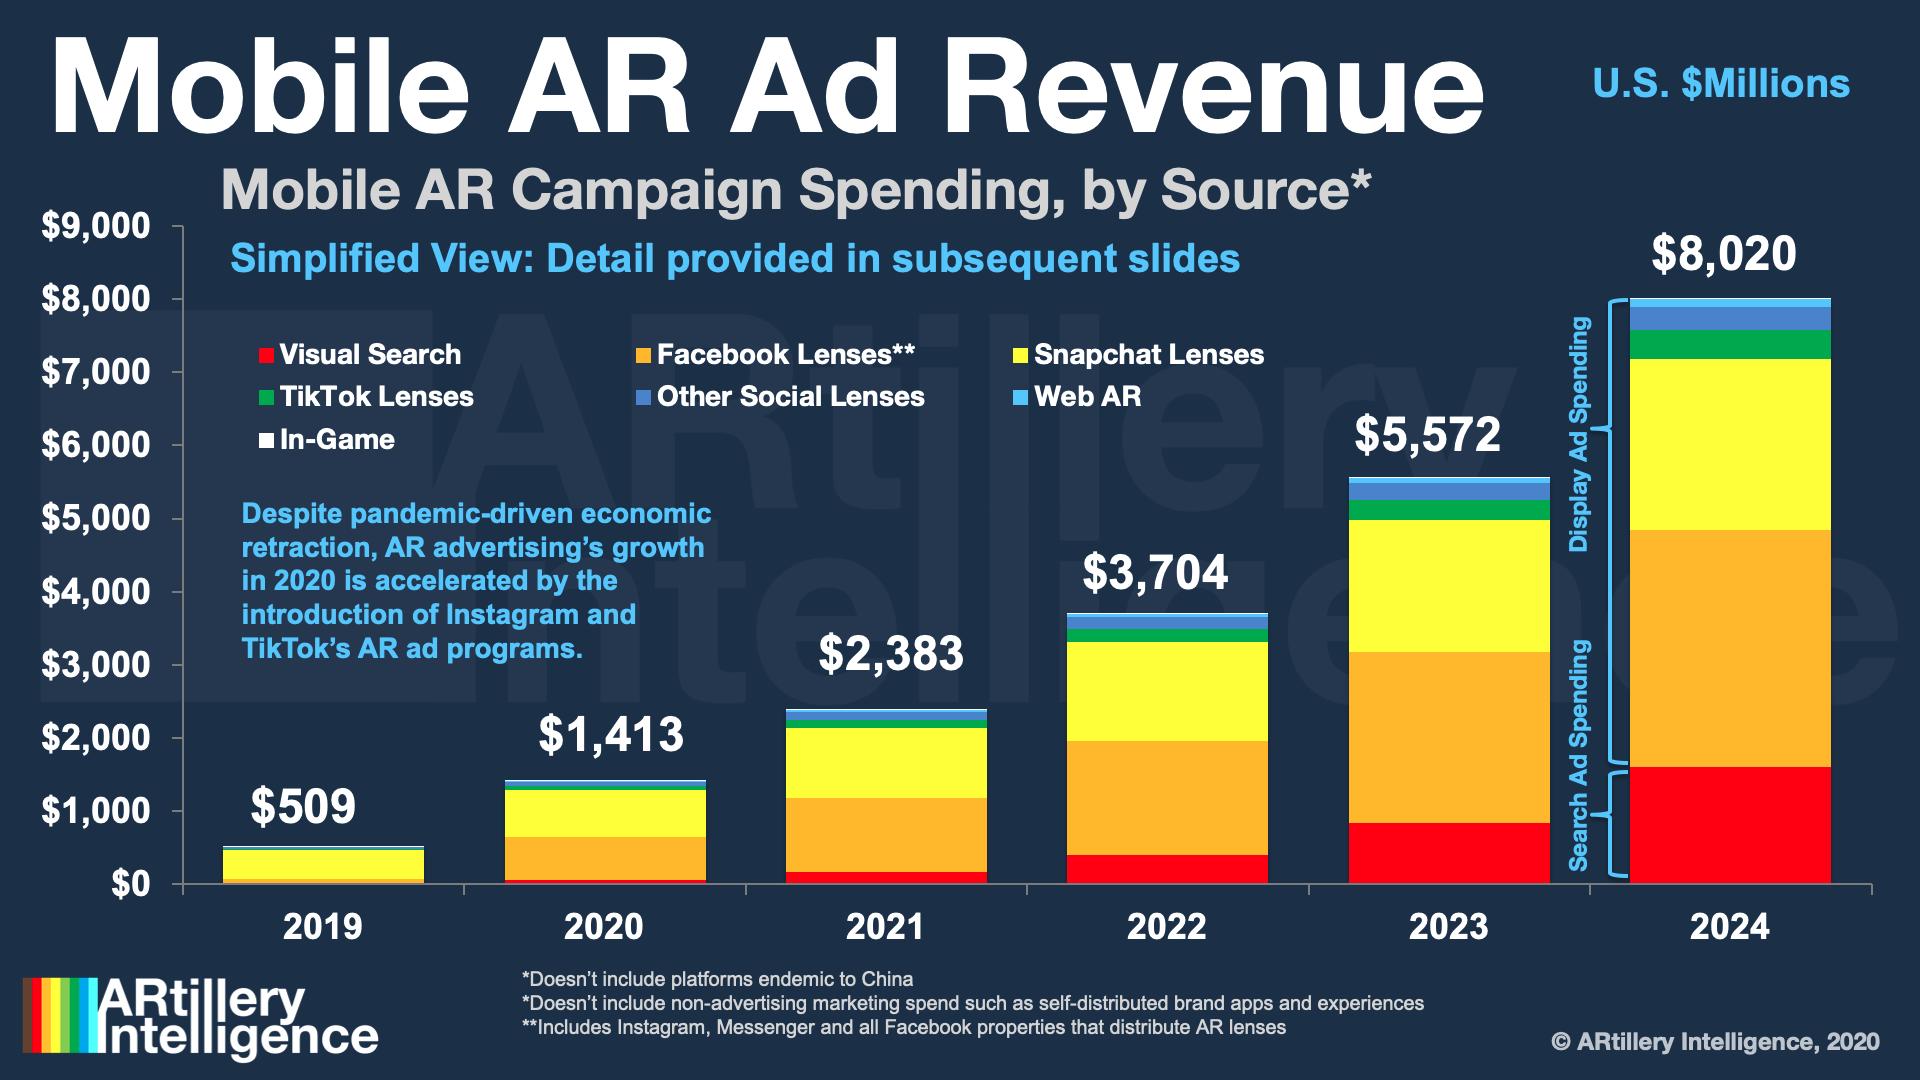 Mobile AR ad revenue ARtillery Intelligence